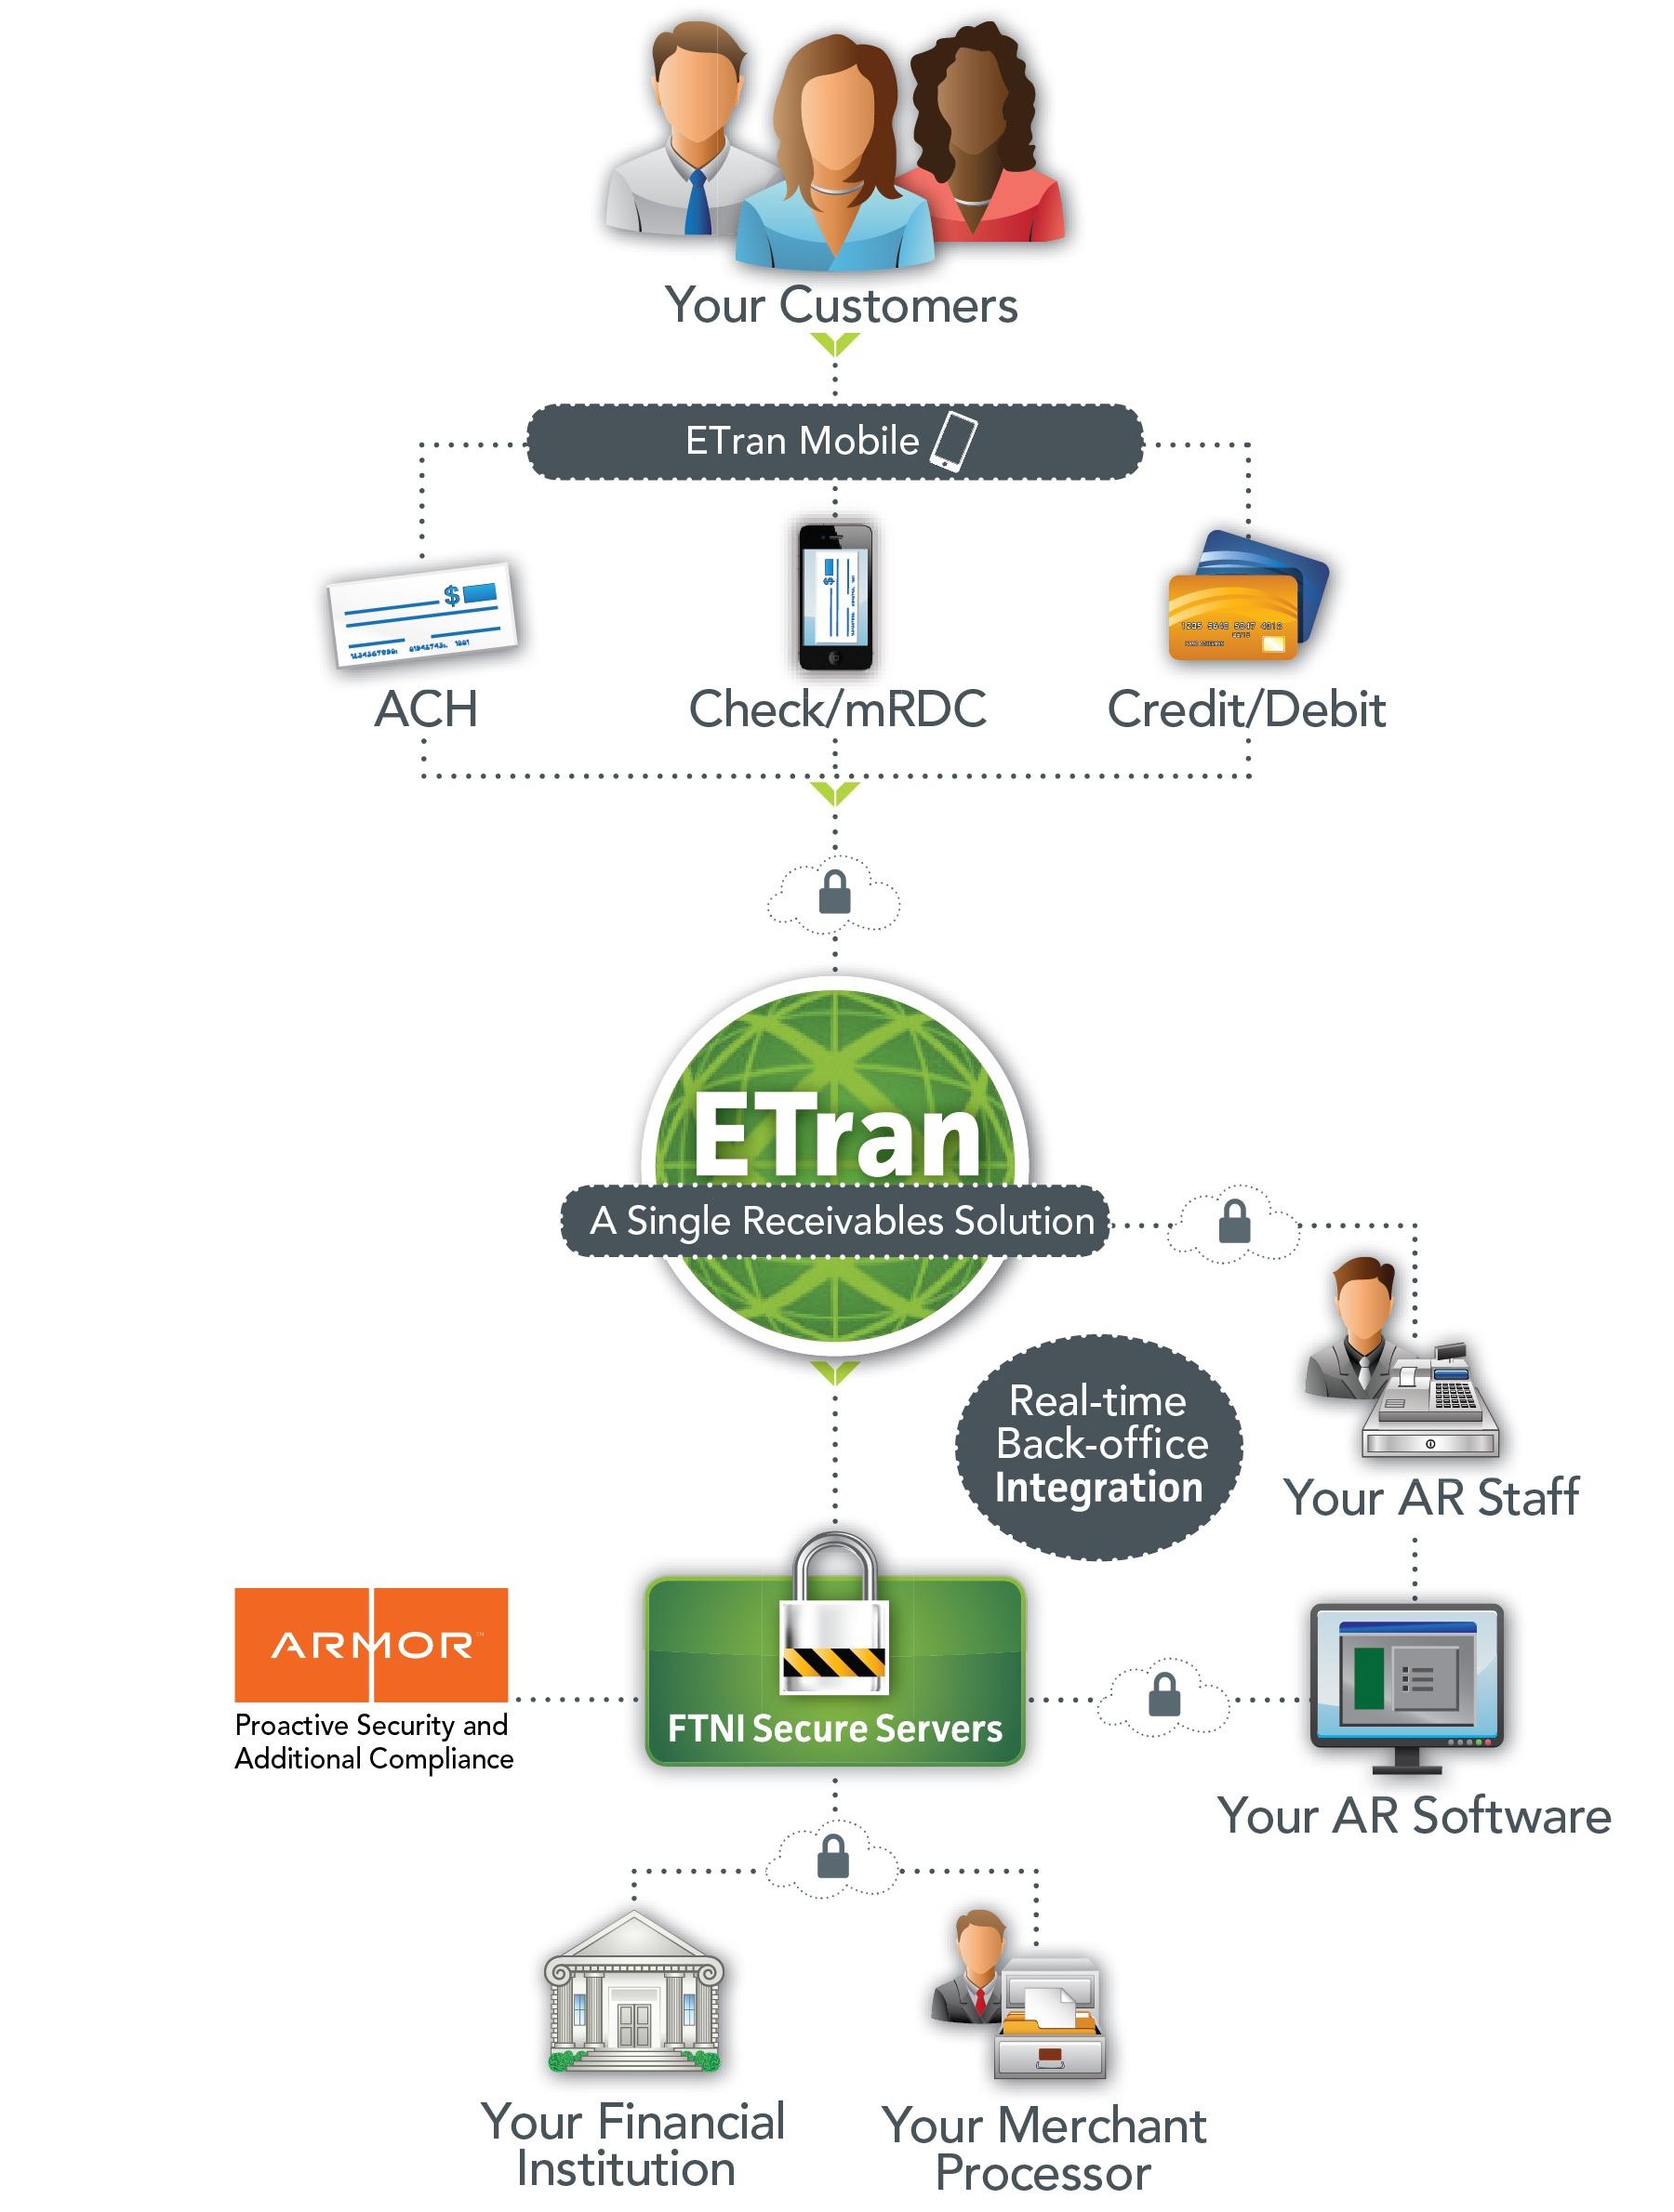 ETran_Mobile